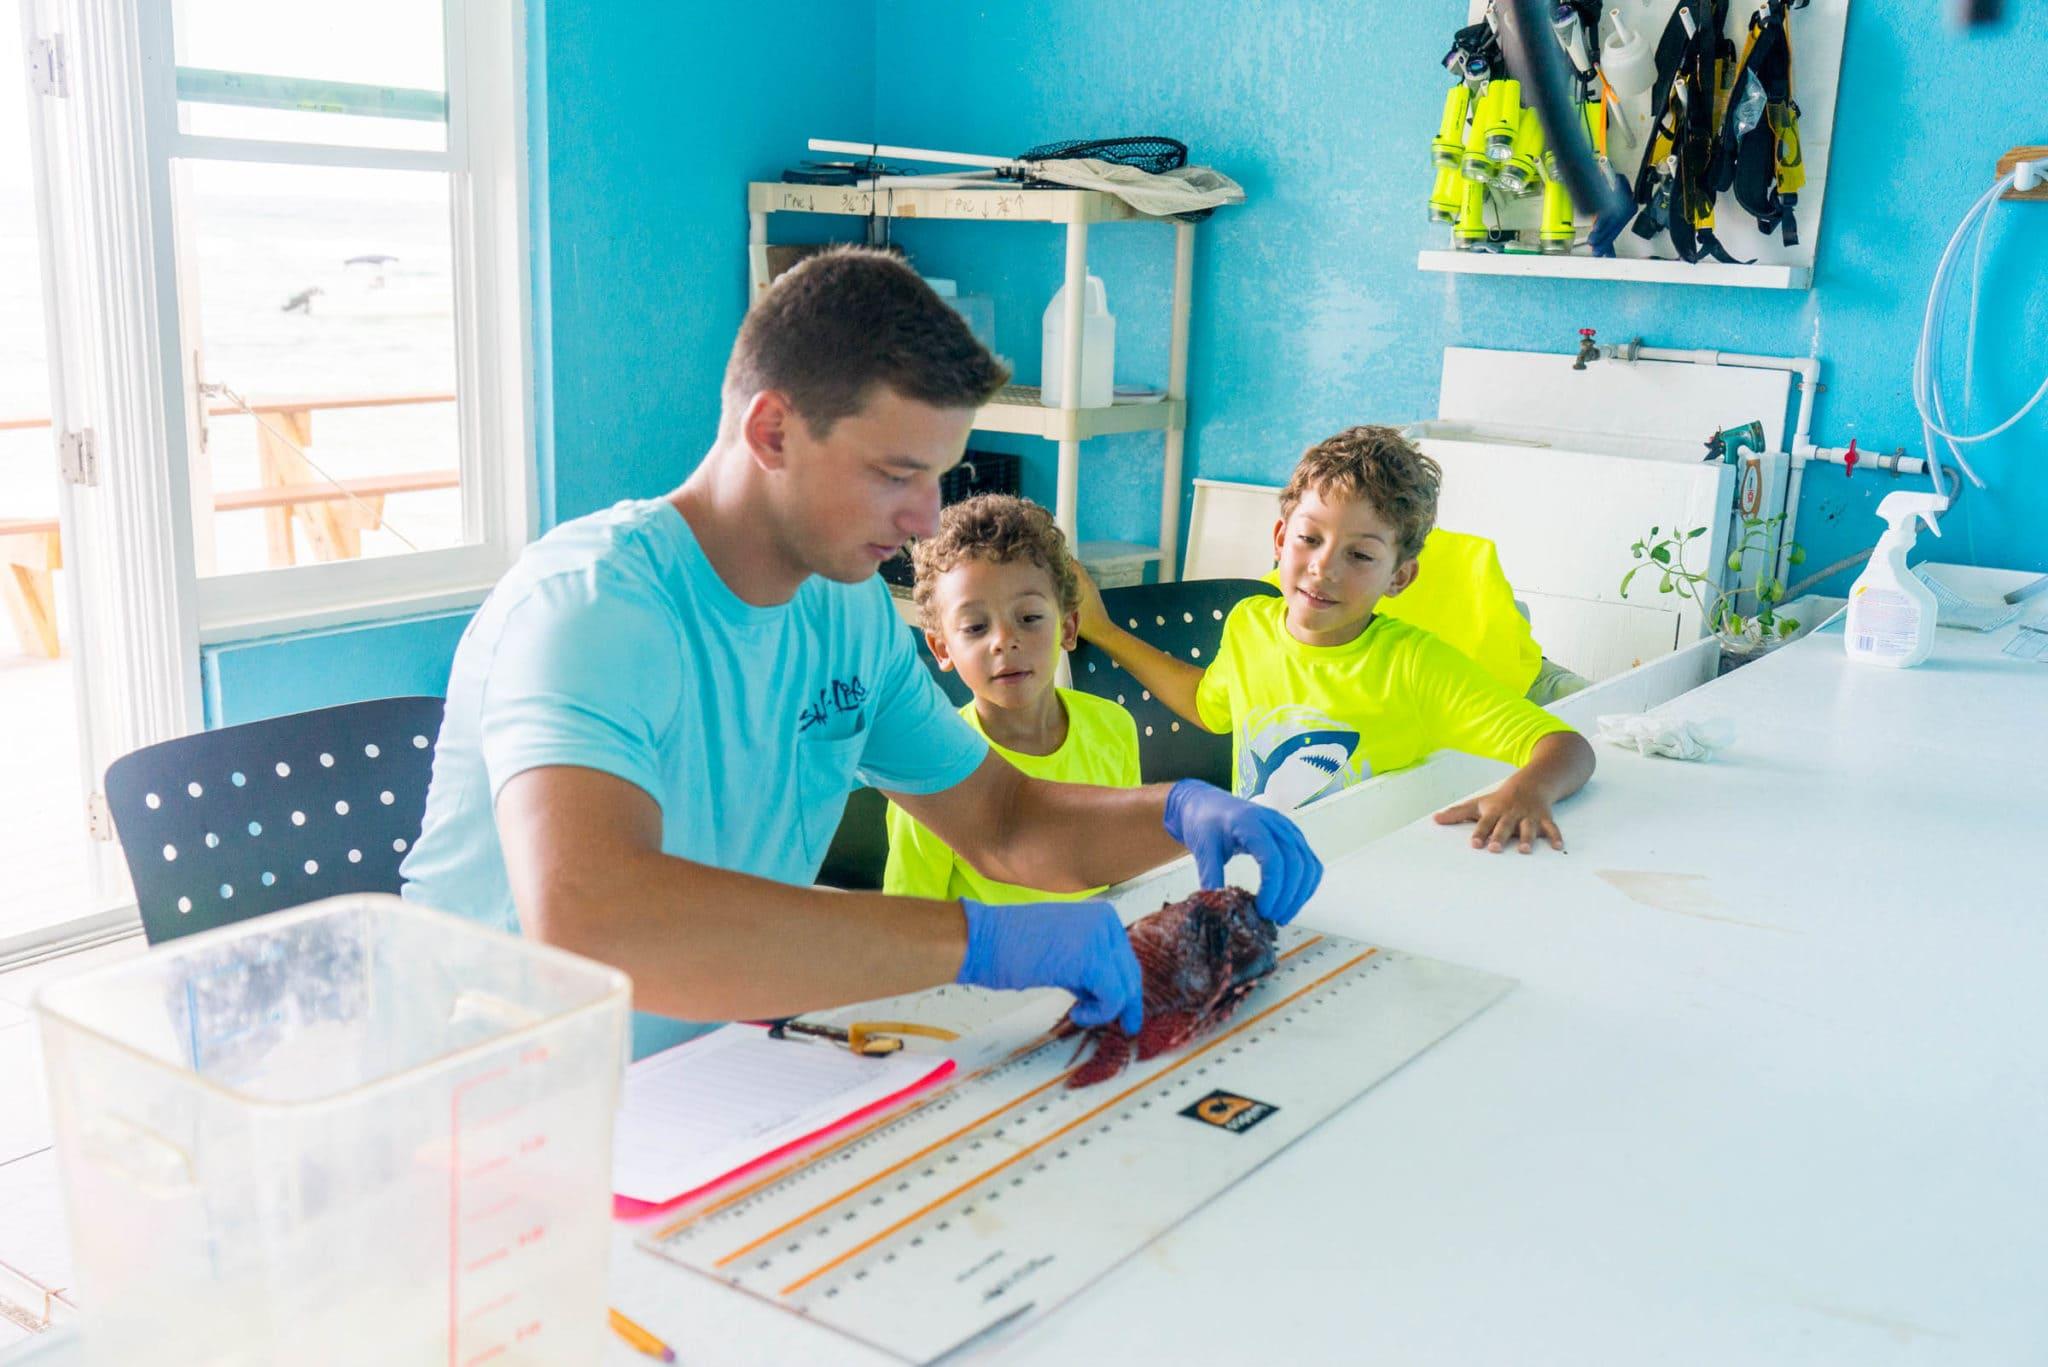 The Central Caribbean Marine Institute